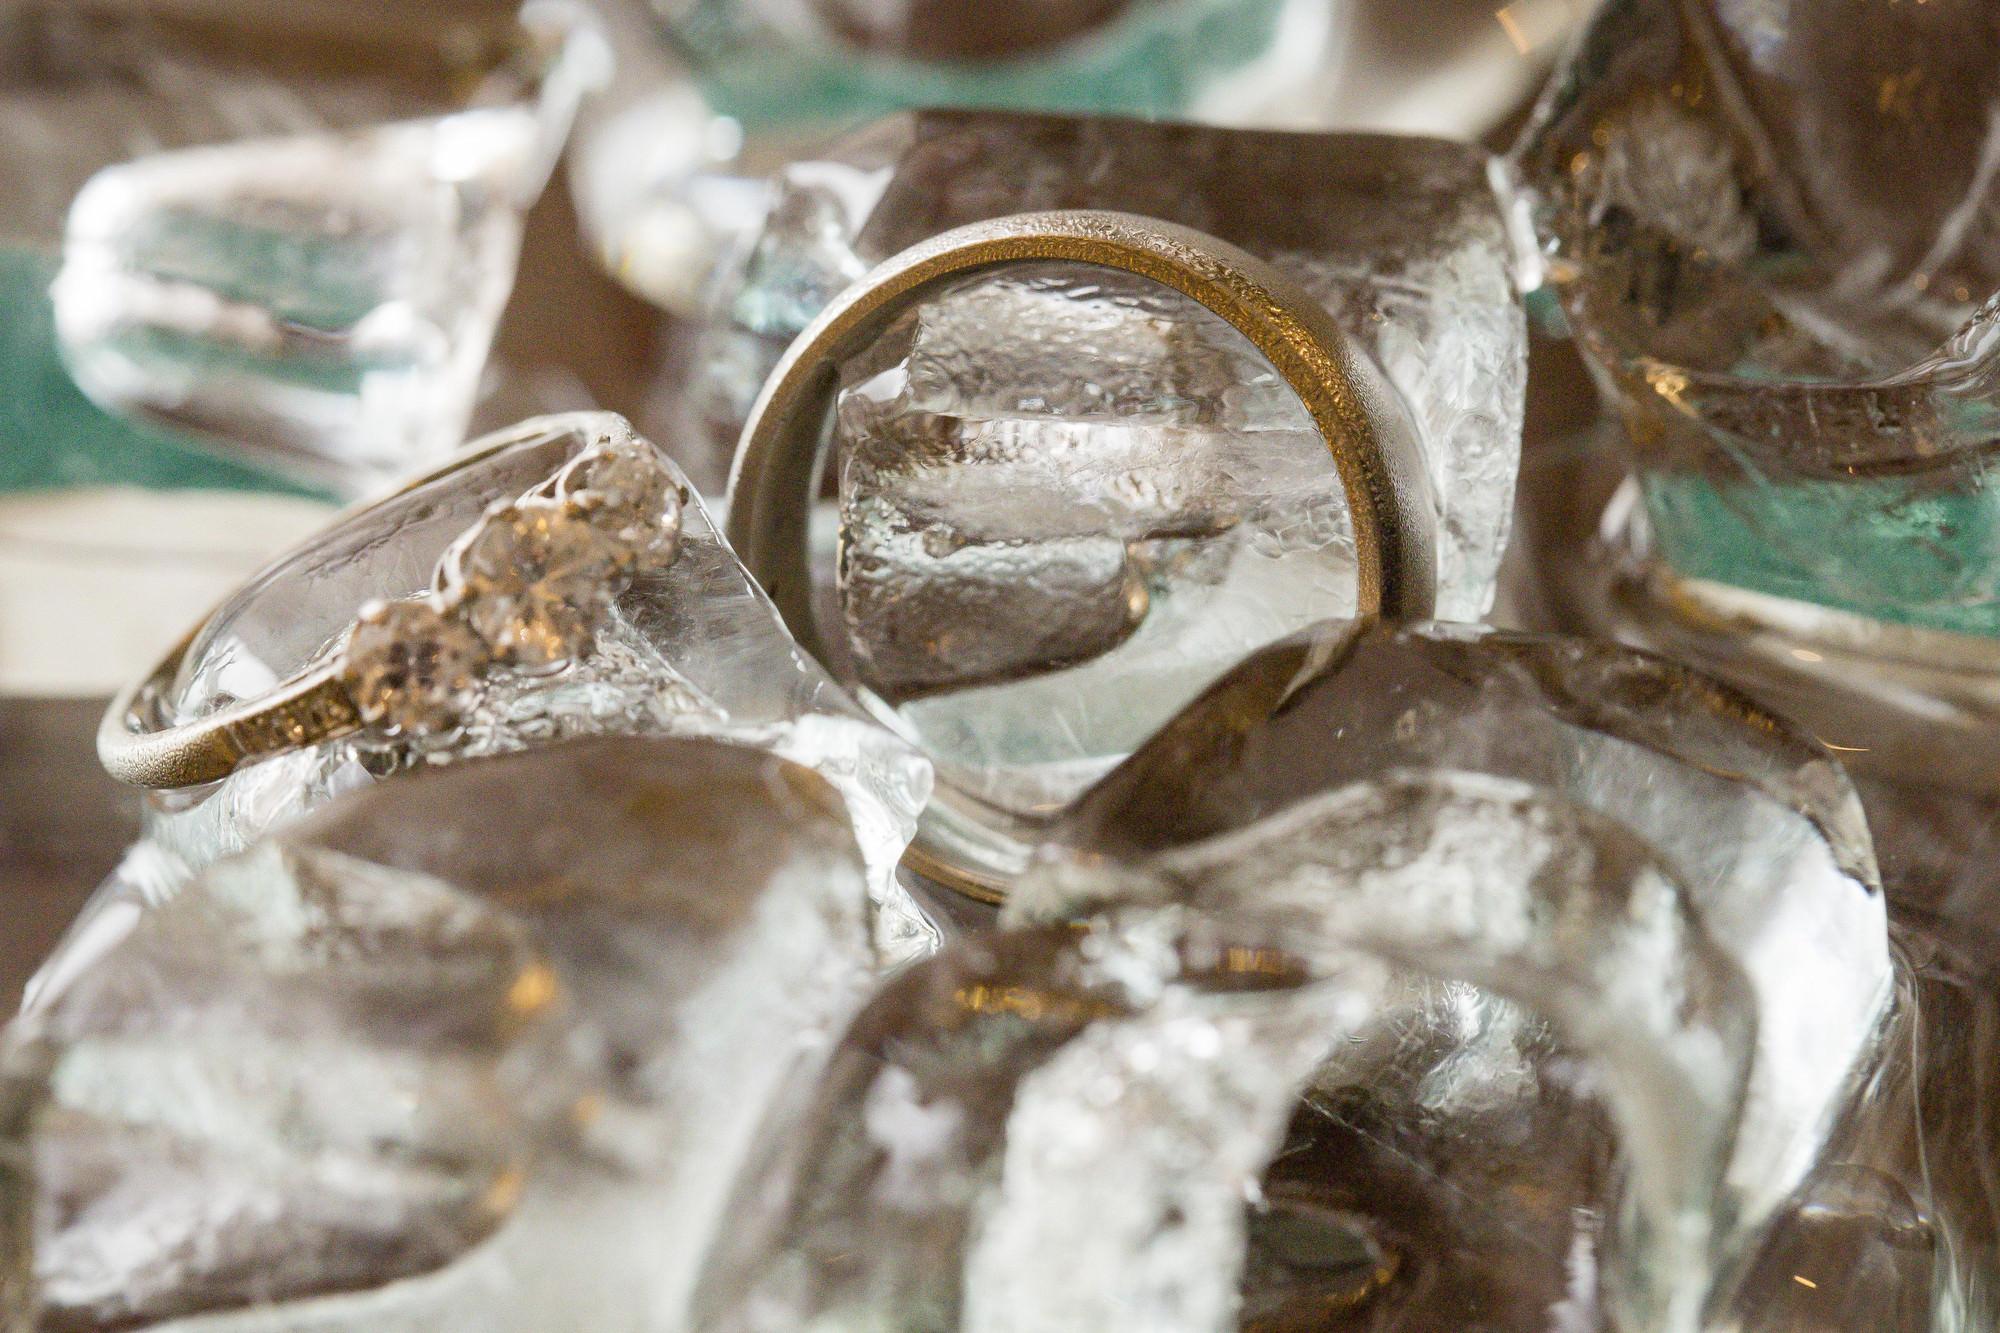 muckross_park_hotel_grougane_barra_wedding_photographer_goldenmoments_012.jpg